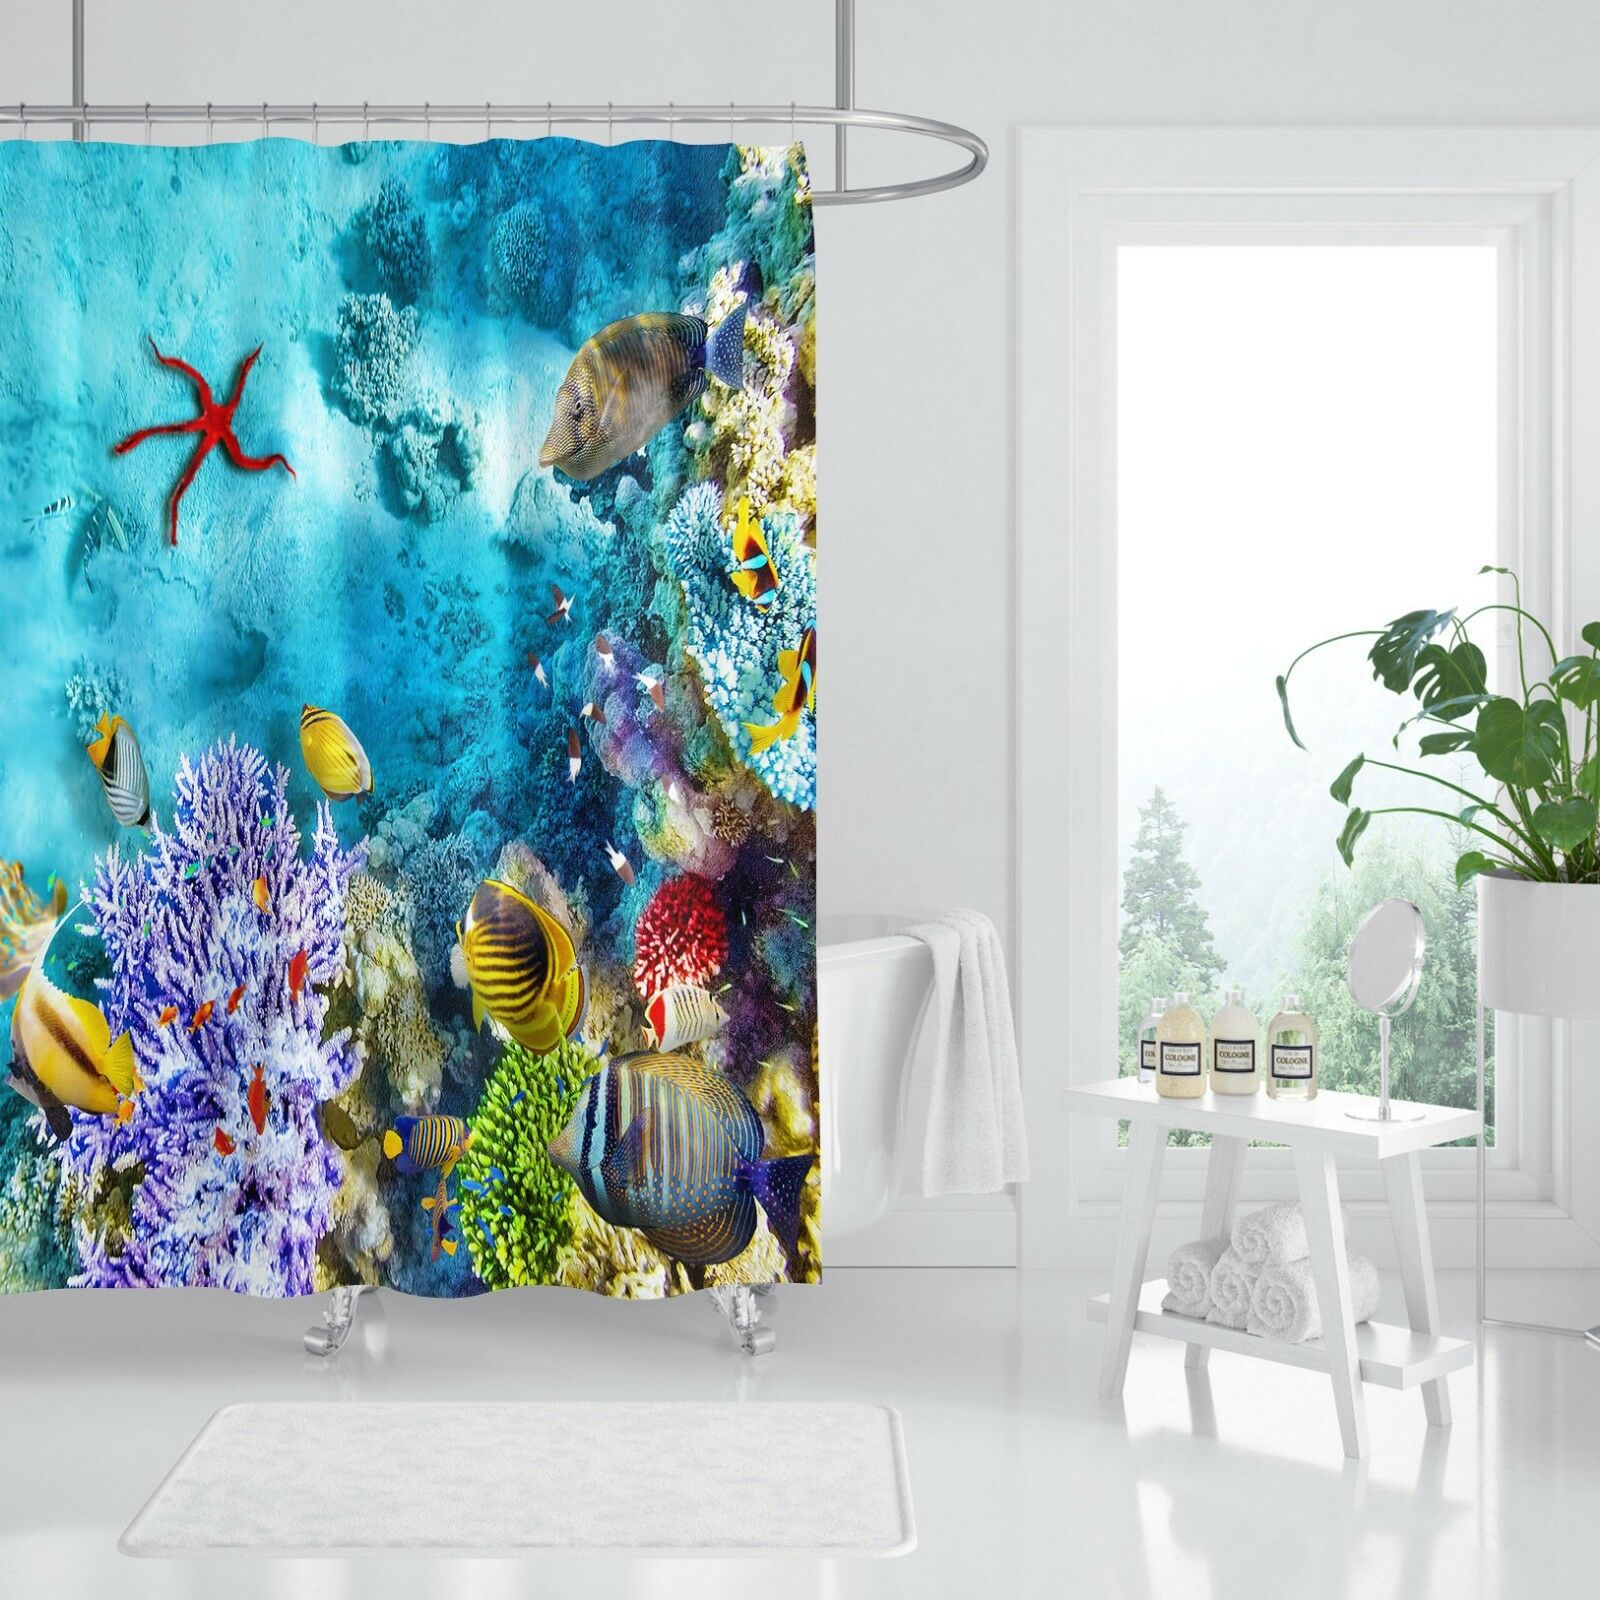 3D Seestern 534 Duschvorhang Wasserdicht Faser Bad Daheim Windows Toilette DE